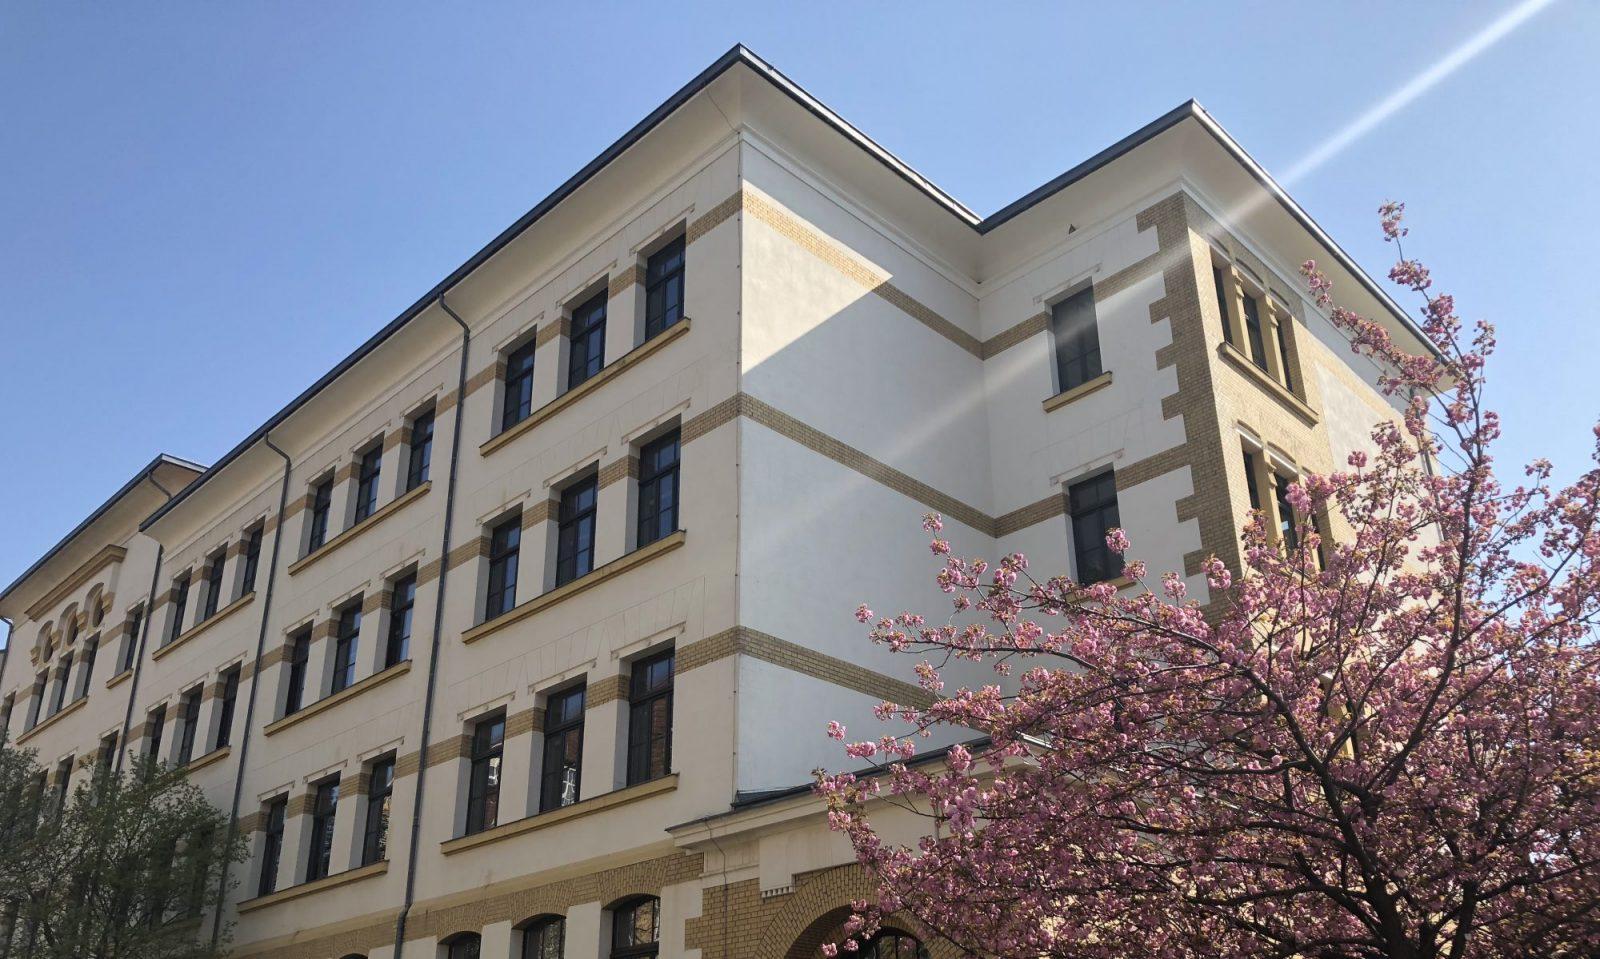 125. Oberschule Leipzig